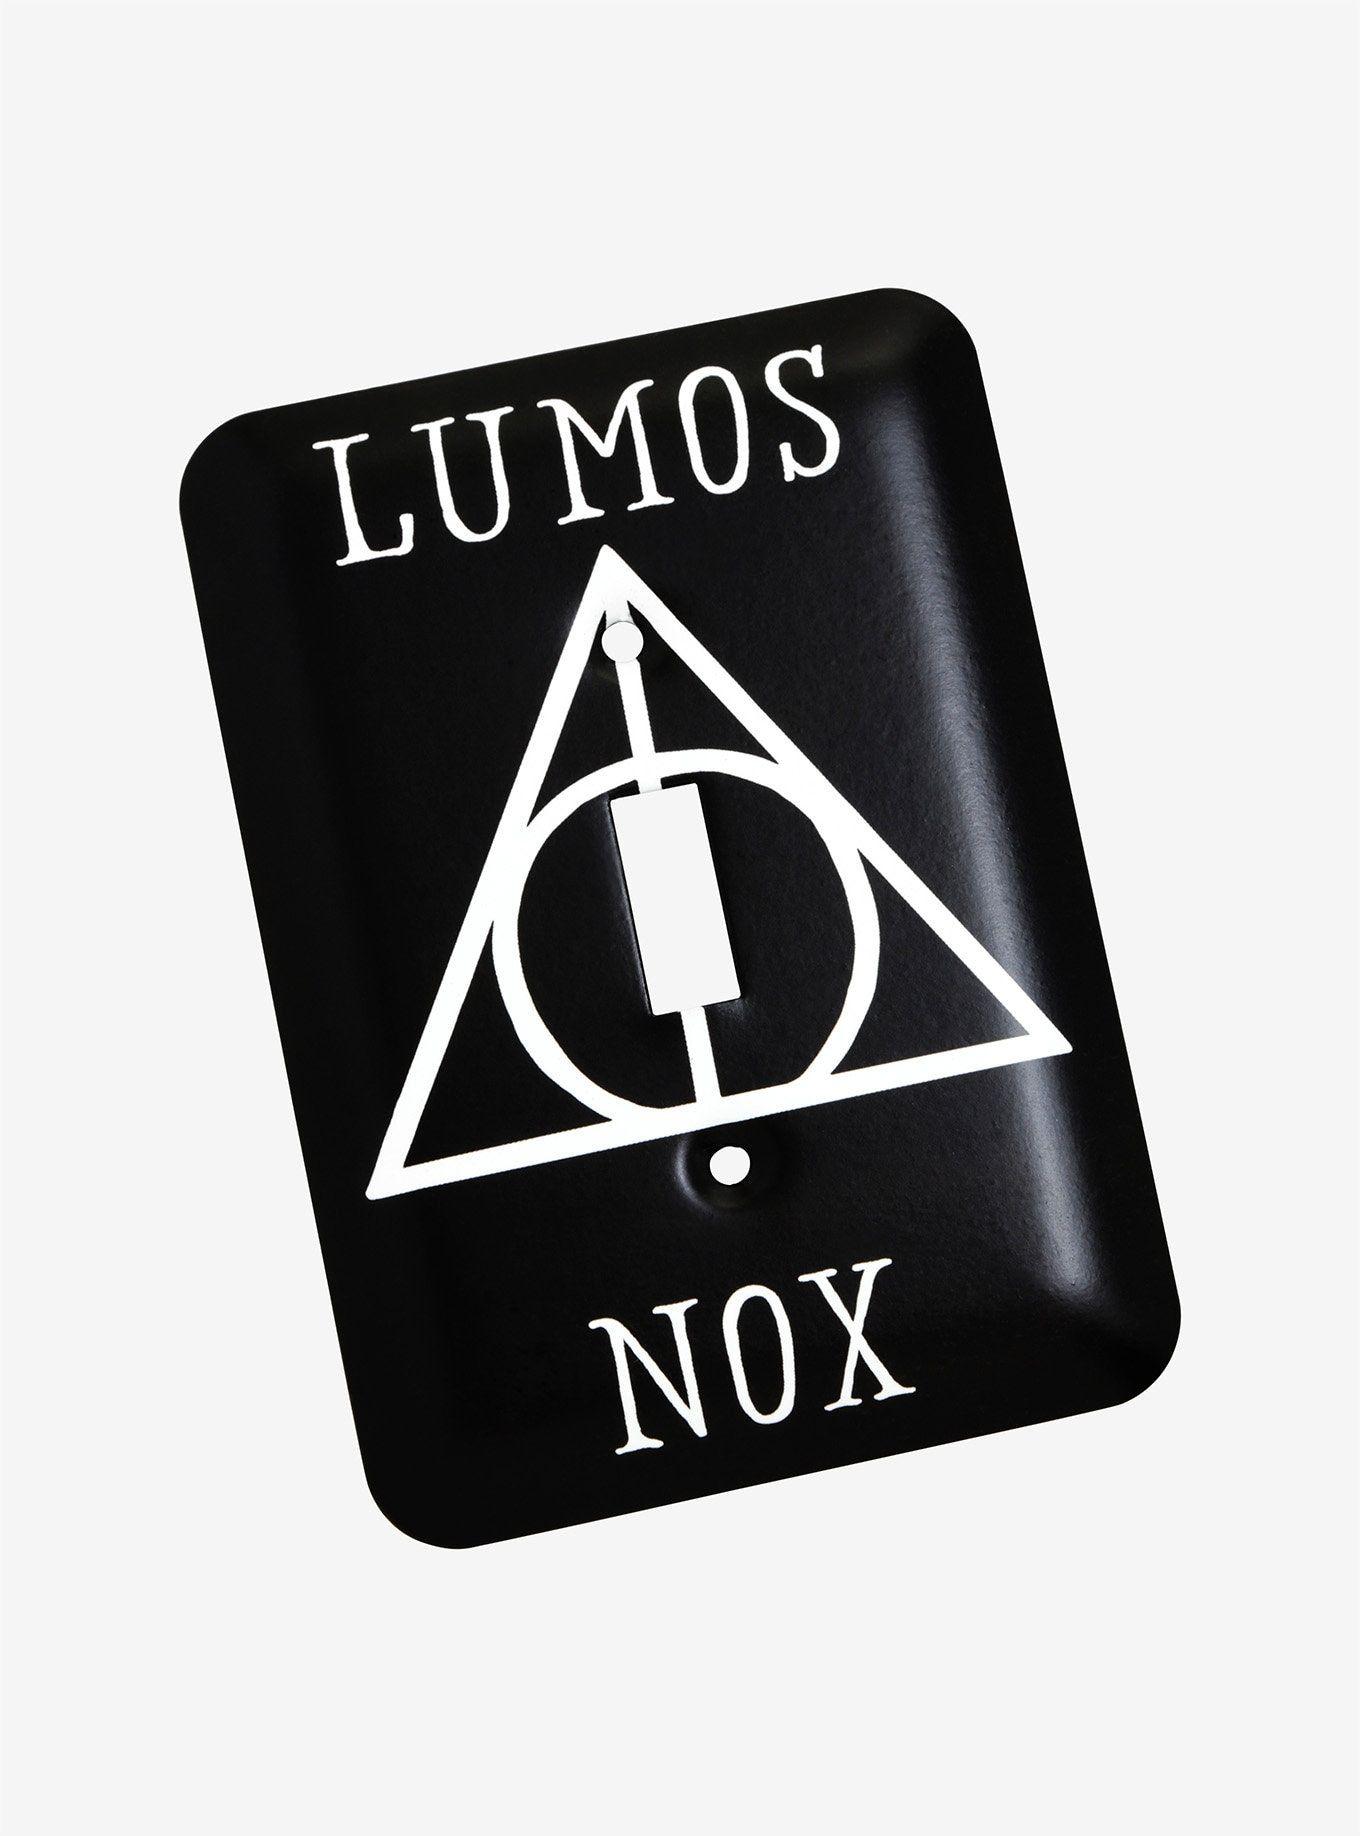 Harry Potter Lumos Nox Switchplate Harry Potter Lumos Lumos Nox Lumos